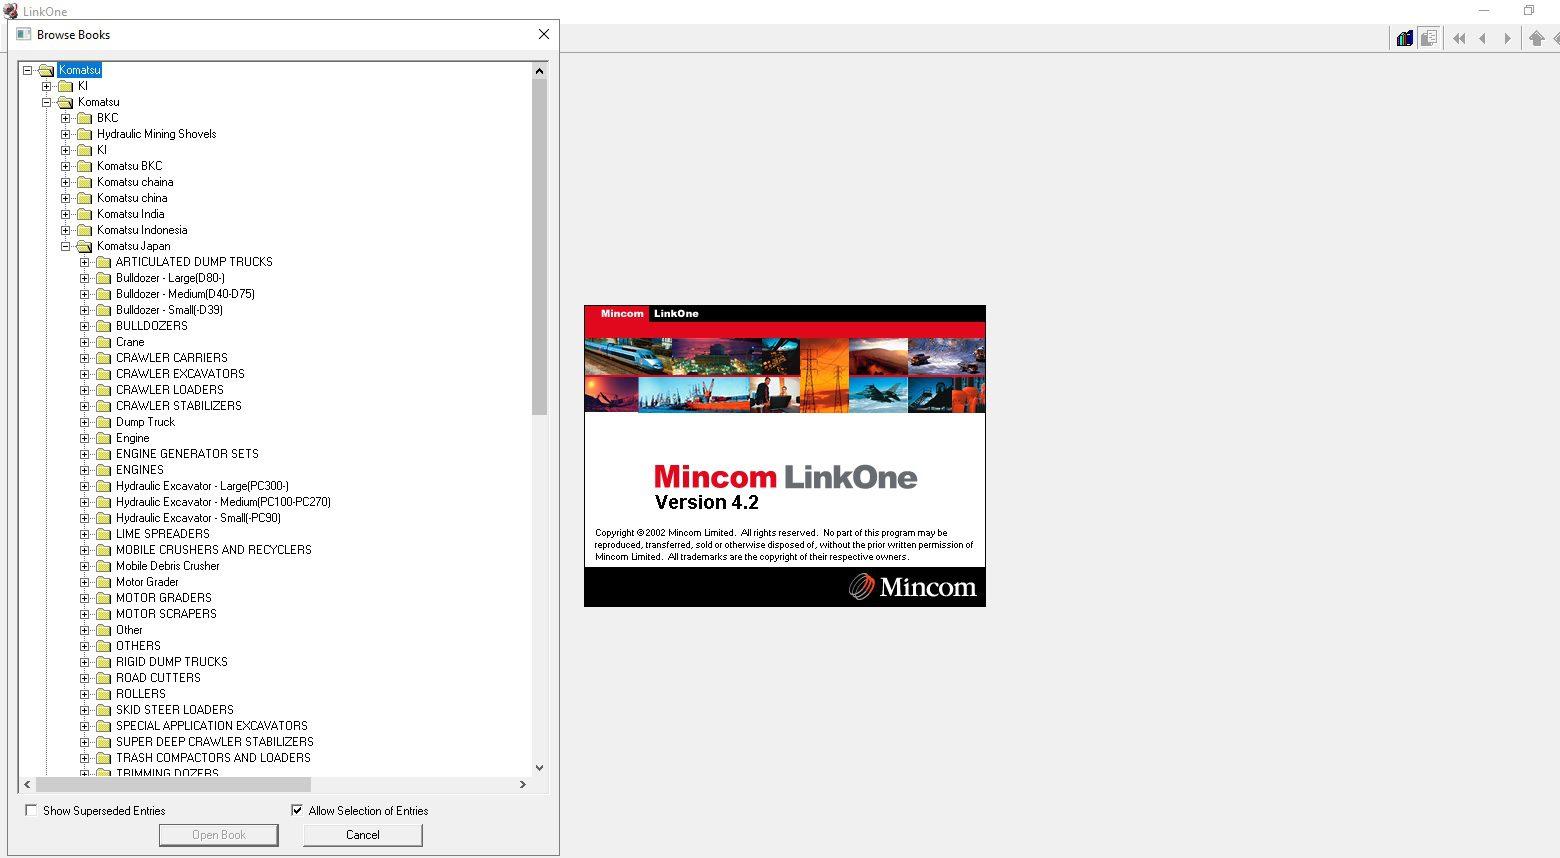 Komatsu_LinkOne_Parts_Catalogue_EPC_112018_Full_Offline6